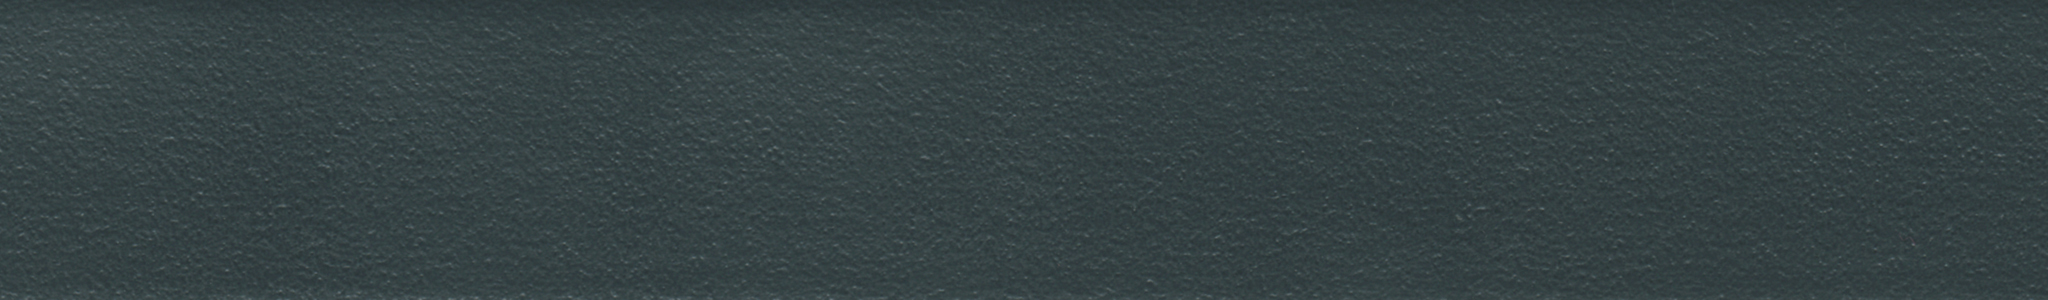 HU 170961 ABS Edge Grey Soft Pearl 107